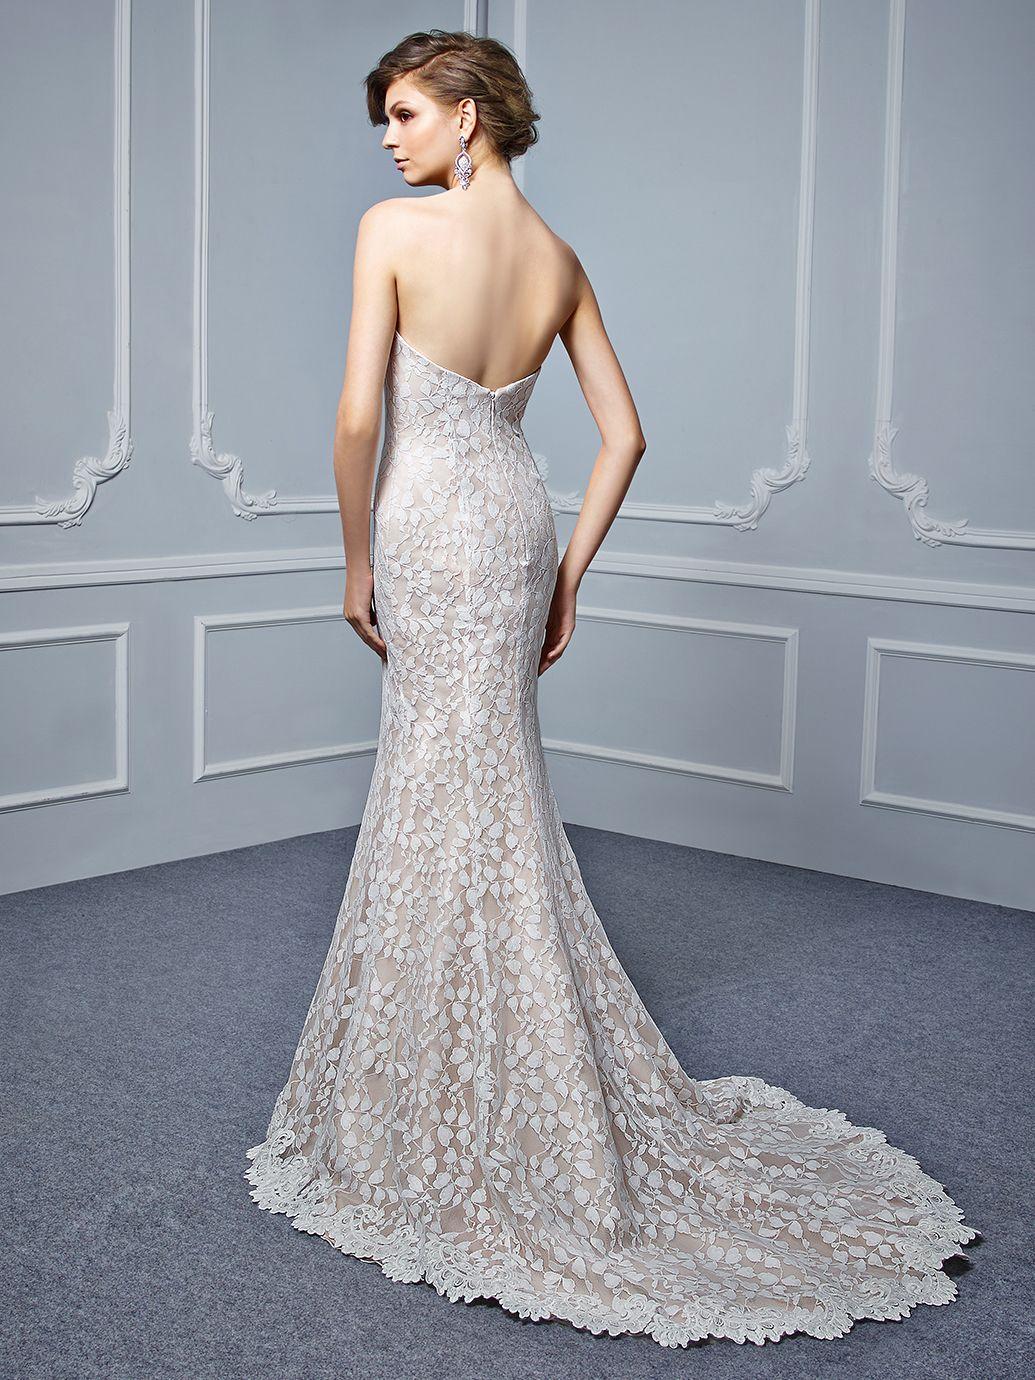 Enzoani wedding dress 2017 Beautiful collection, BT17-25, Back View ...